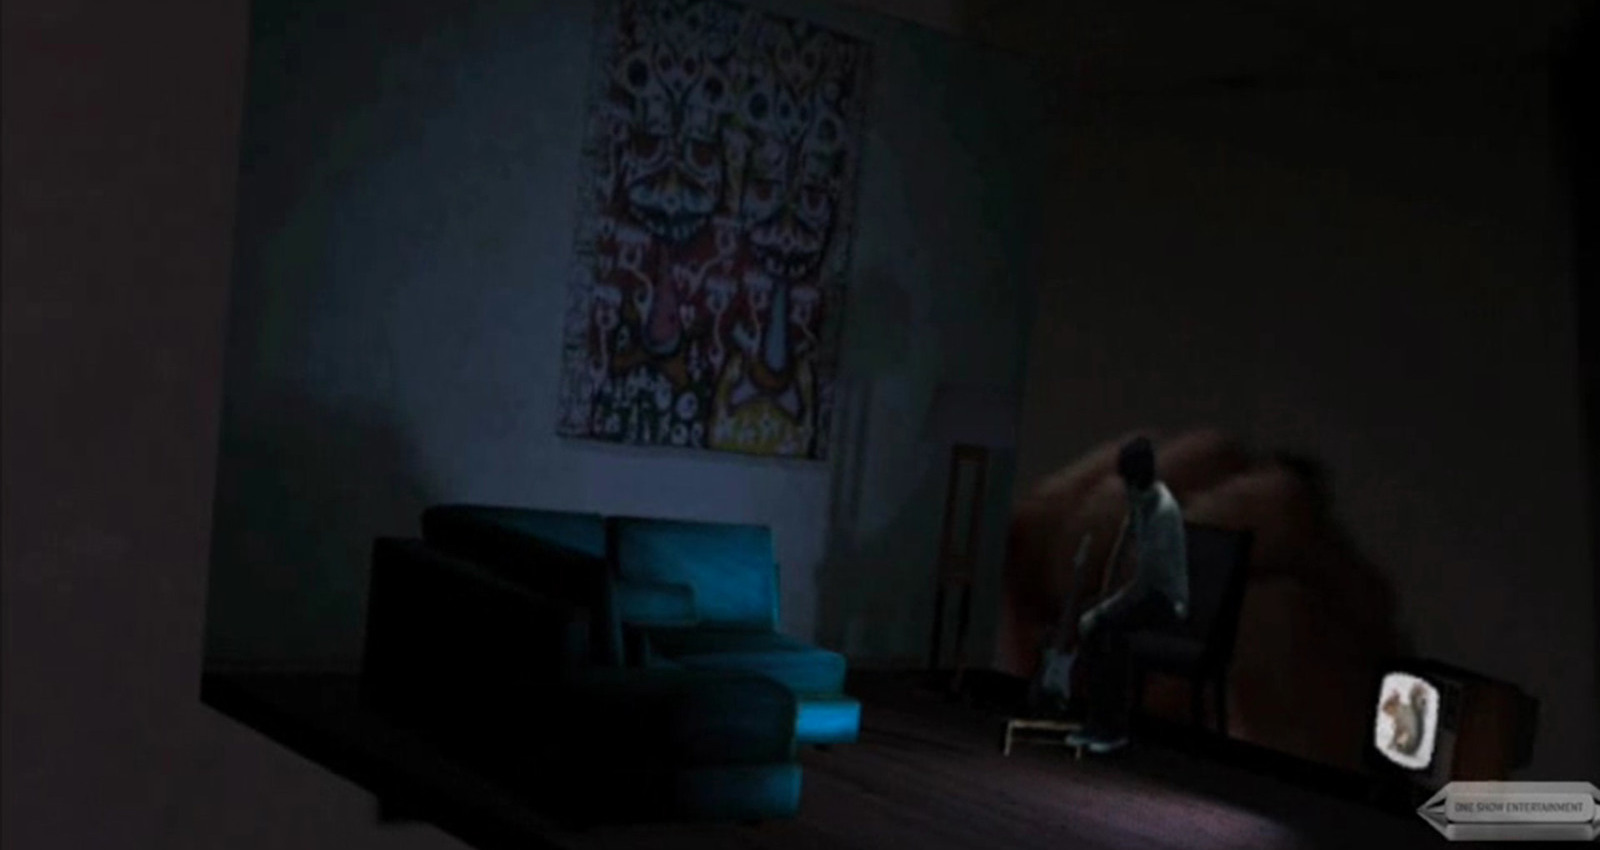 John Mayer Augmented Reality Music Video